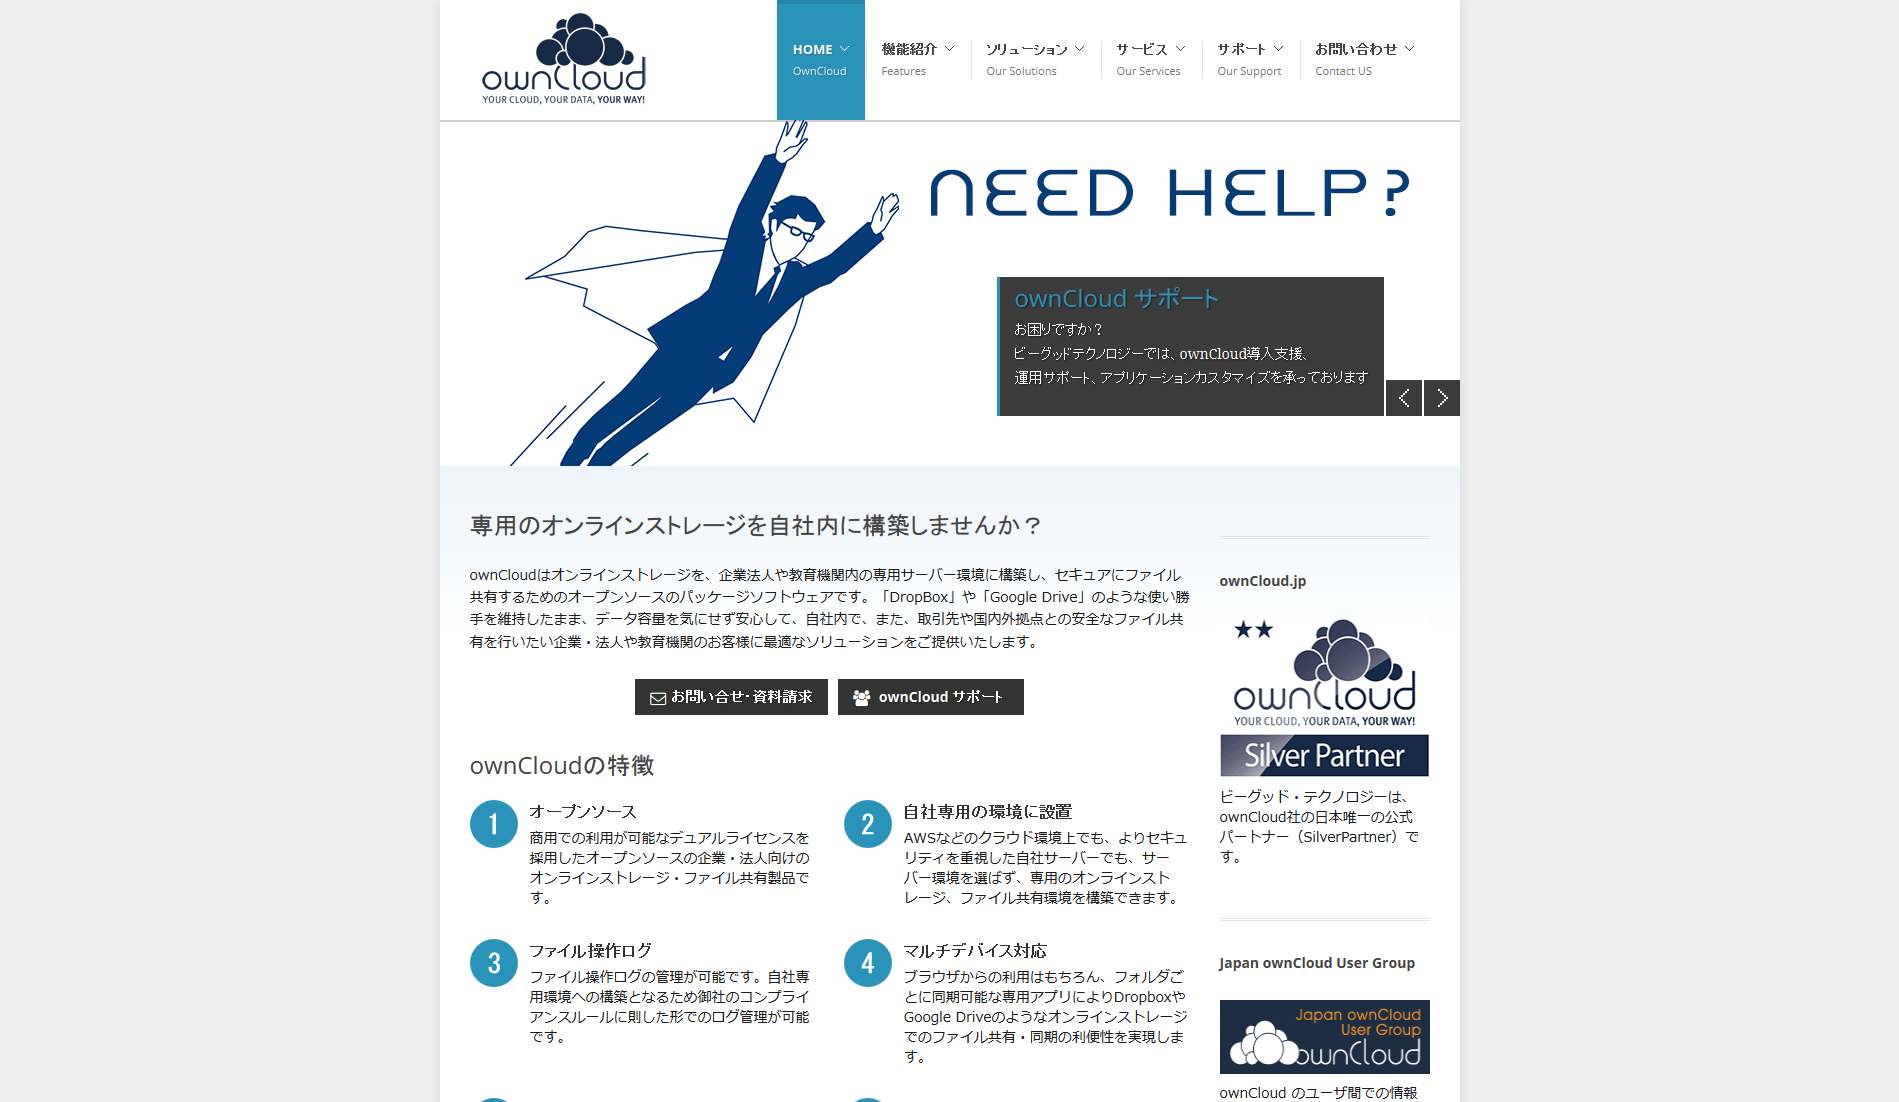 ownCloud公式サイト  法人企業向けファイル共有・オンラインストレージ